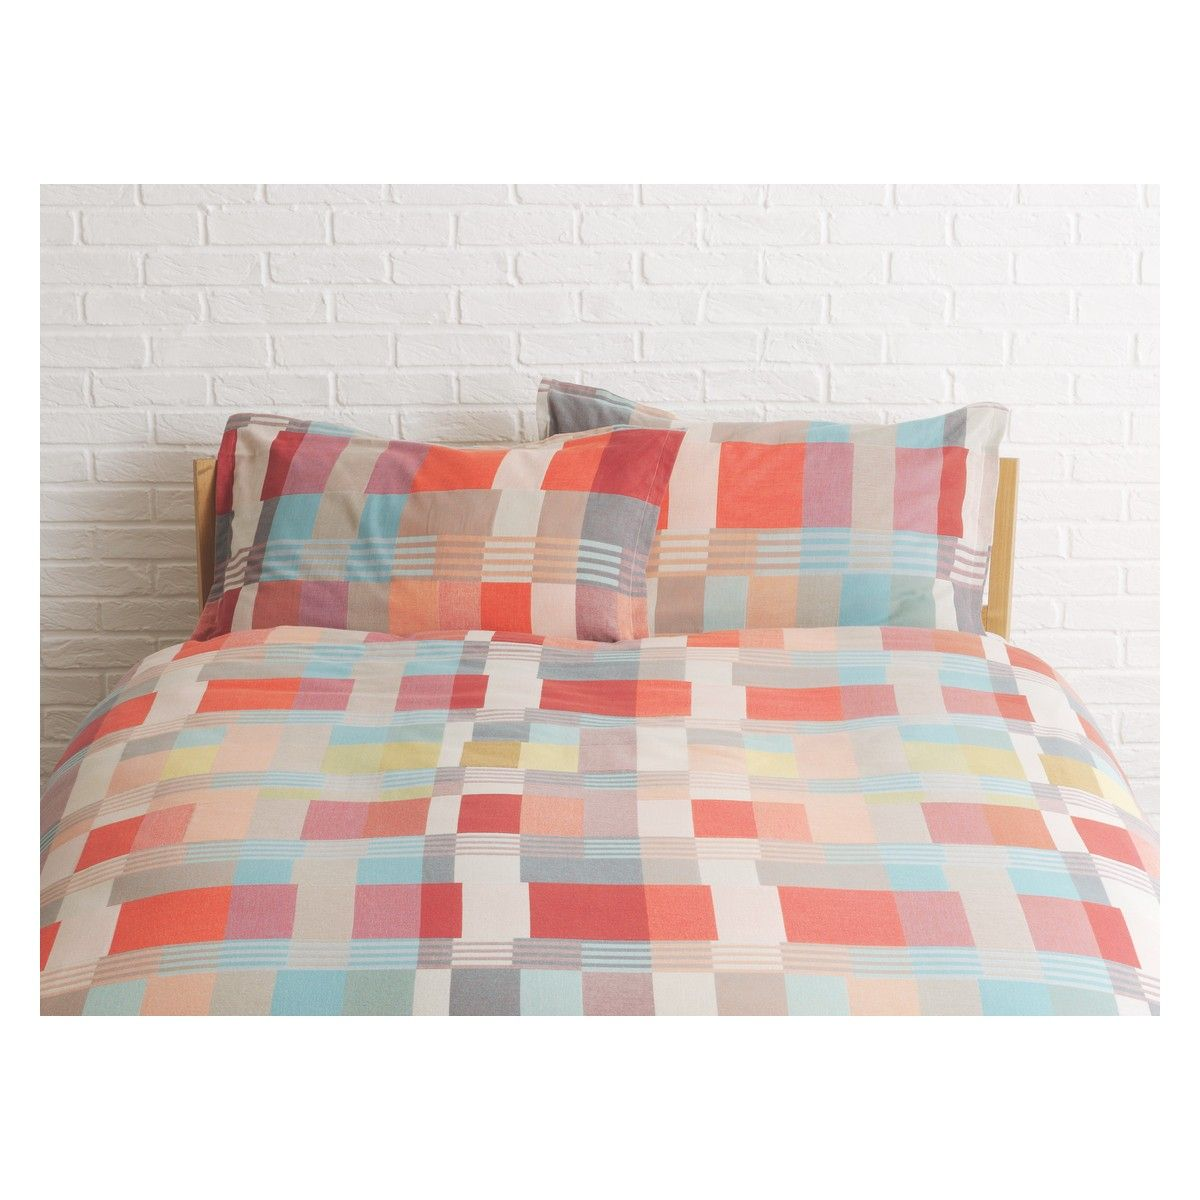 Monica Multi Coloured Patterned Double Duvet Cover Now At Habitat Uk